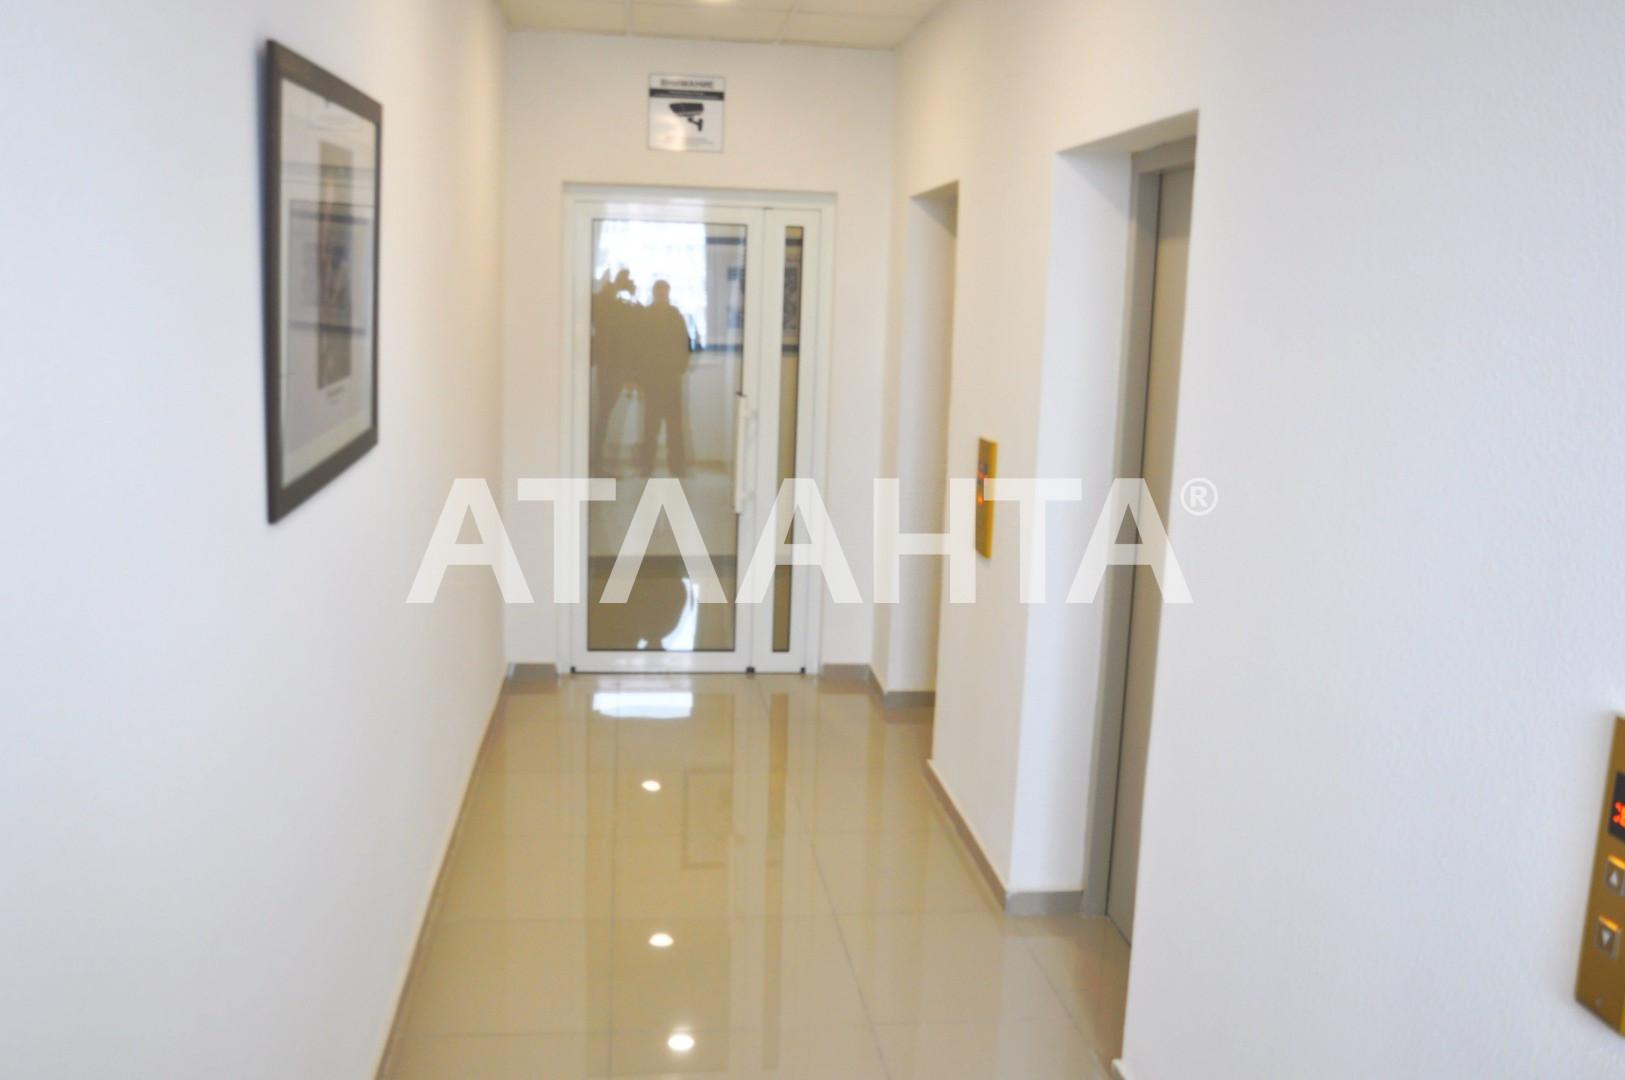 Продается 1-комнатная Квартира на ул. Генуэзская — 45 500 у.е. (фото №10)